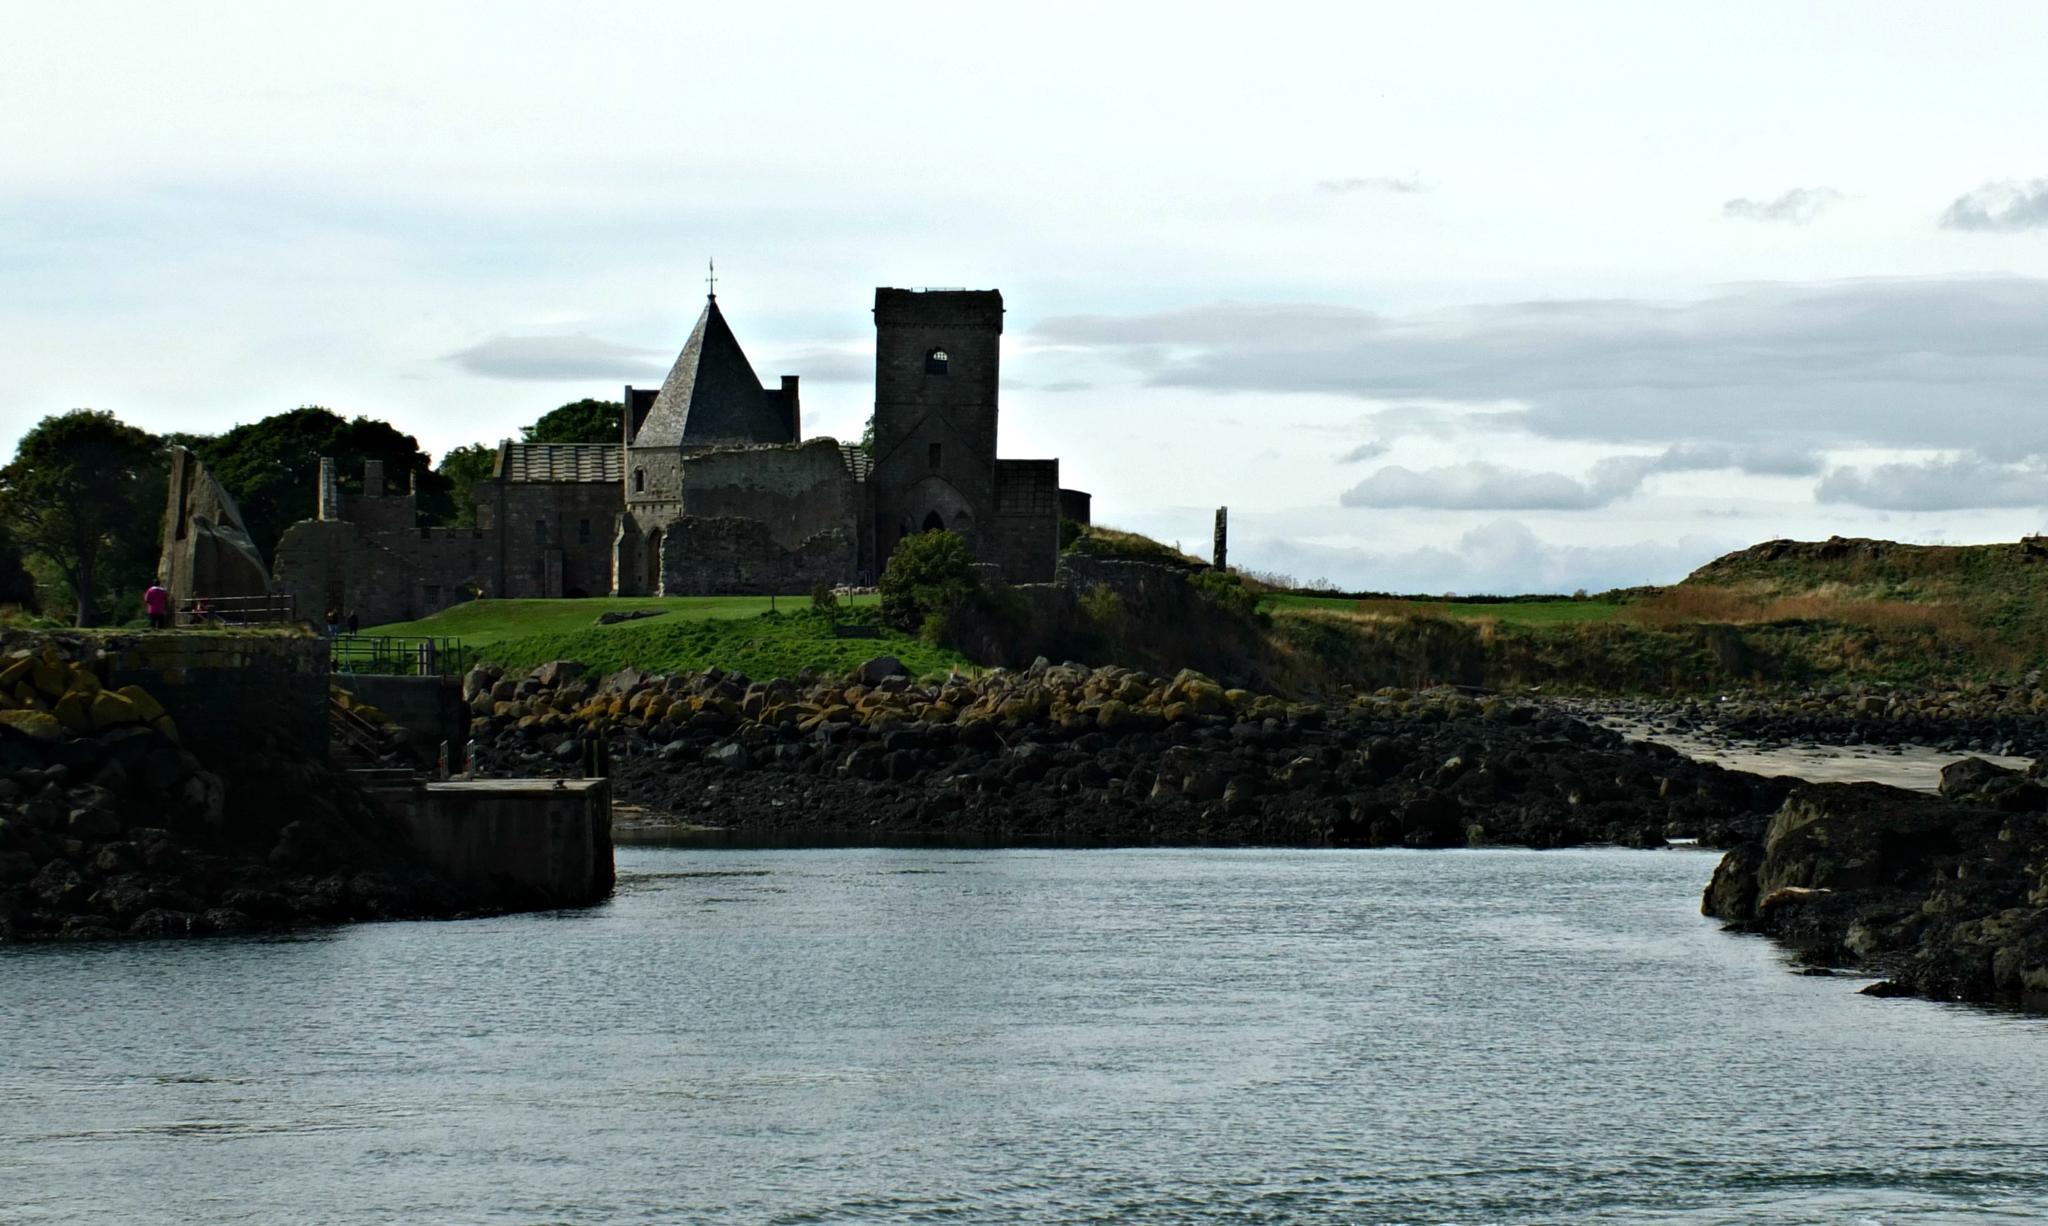 Inchcolm Island, Firth of Forth, Scotland by Cora